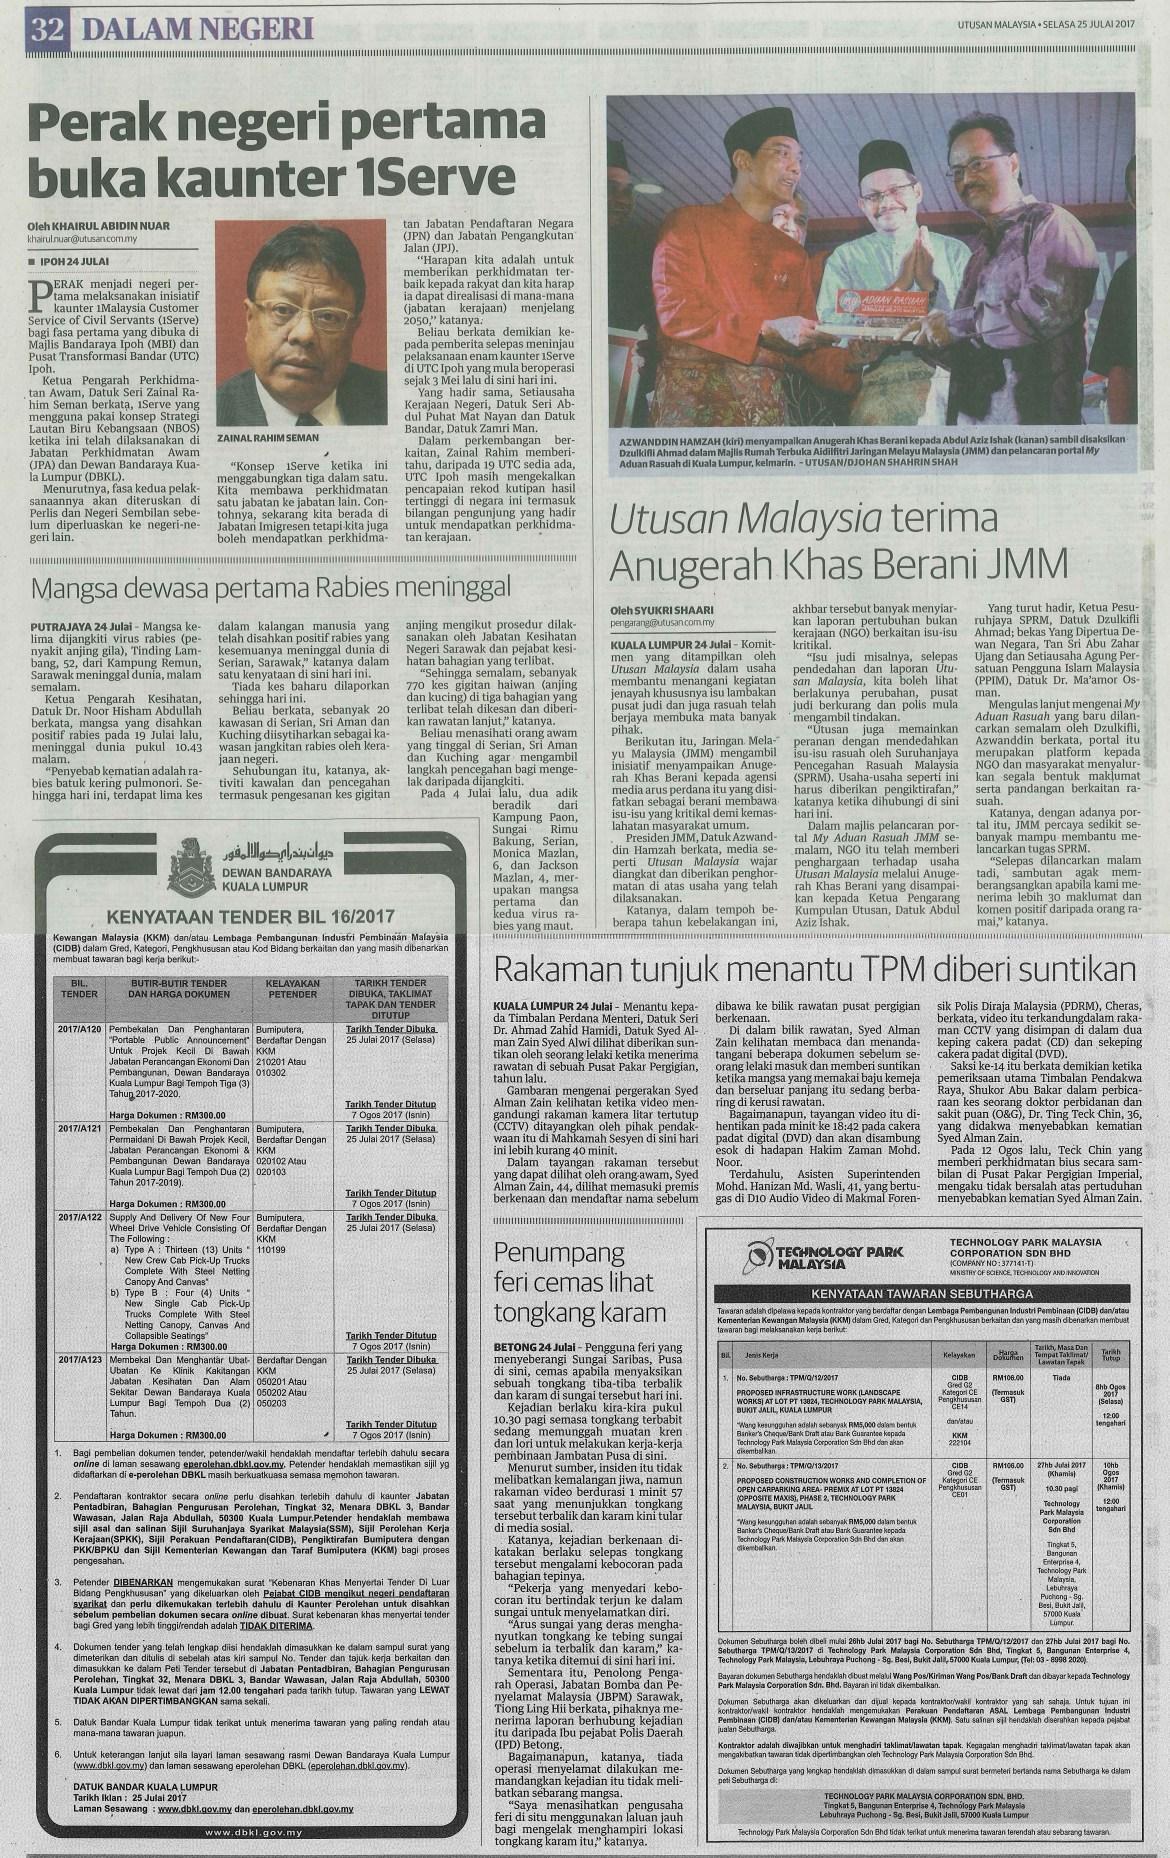 utusan malaysia 25.7.2017 2